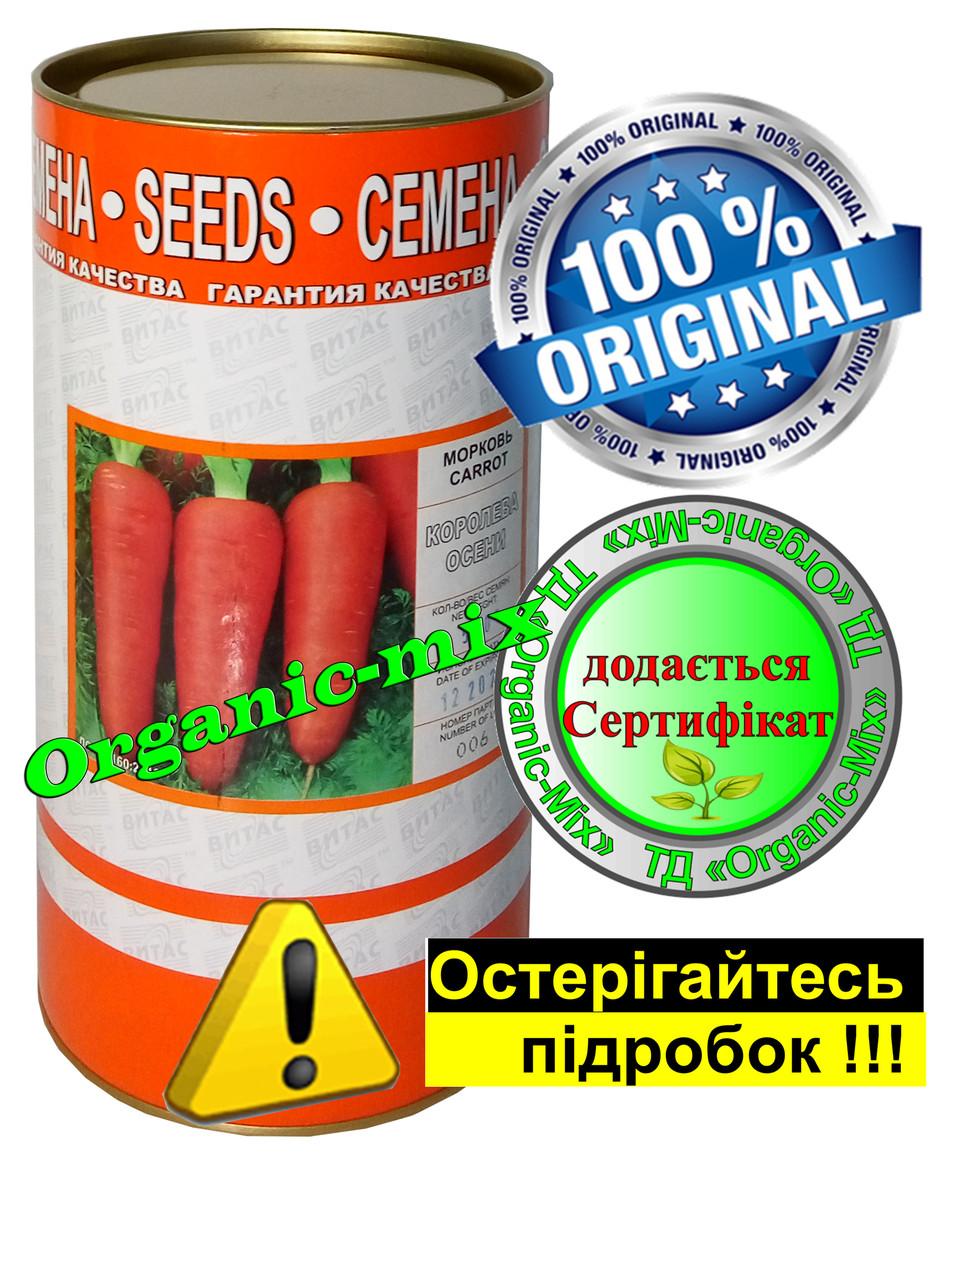 Морковь Королева Осени (Россия), 500 грамм банка